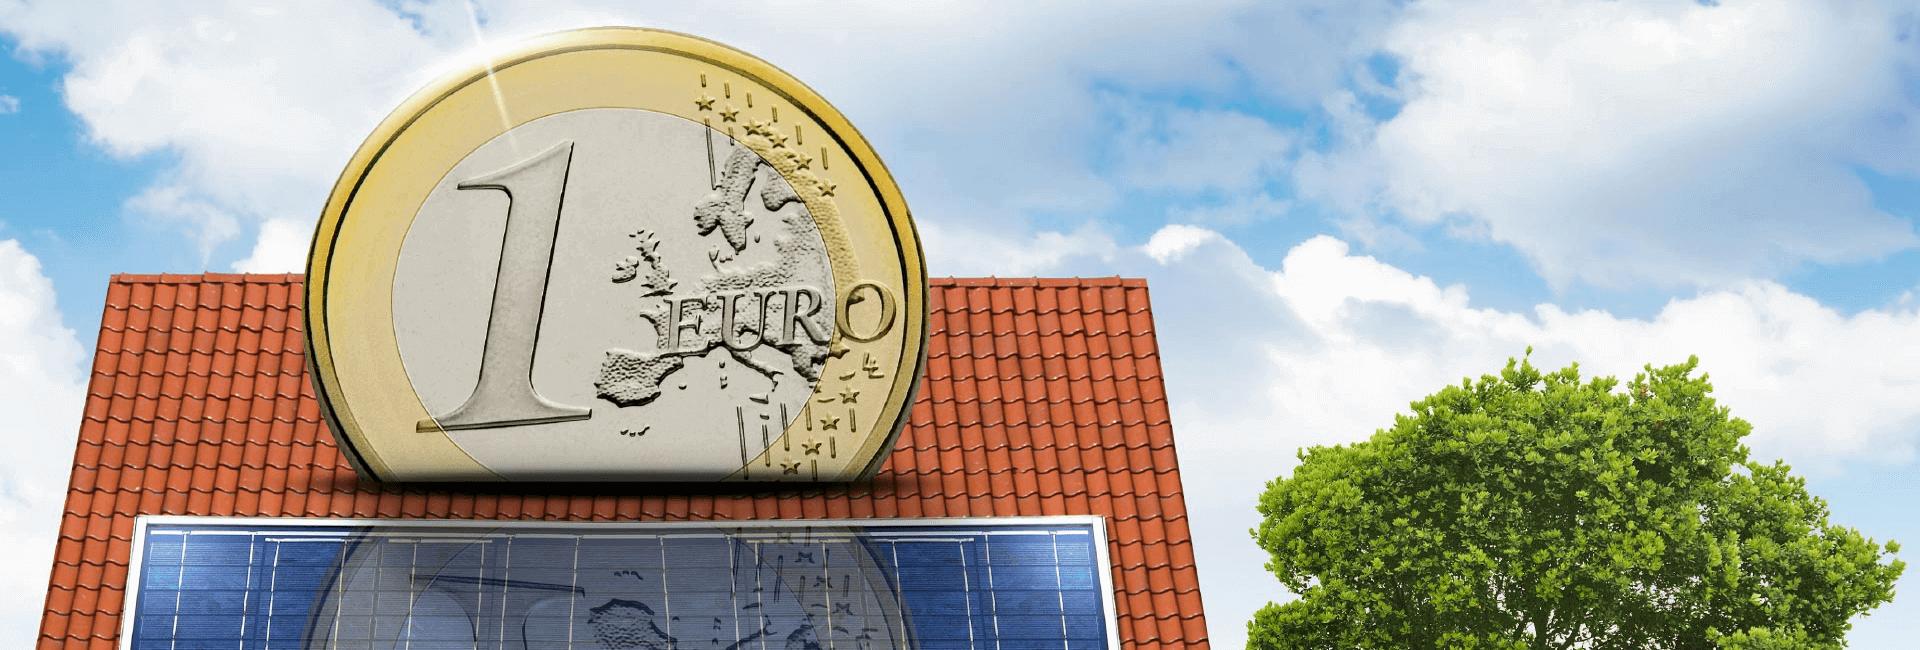 economie-installation-photovoltaique